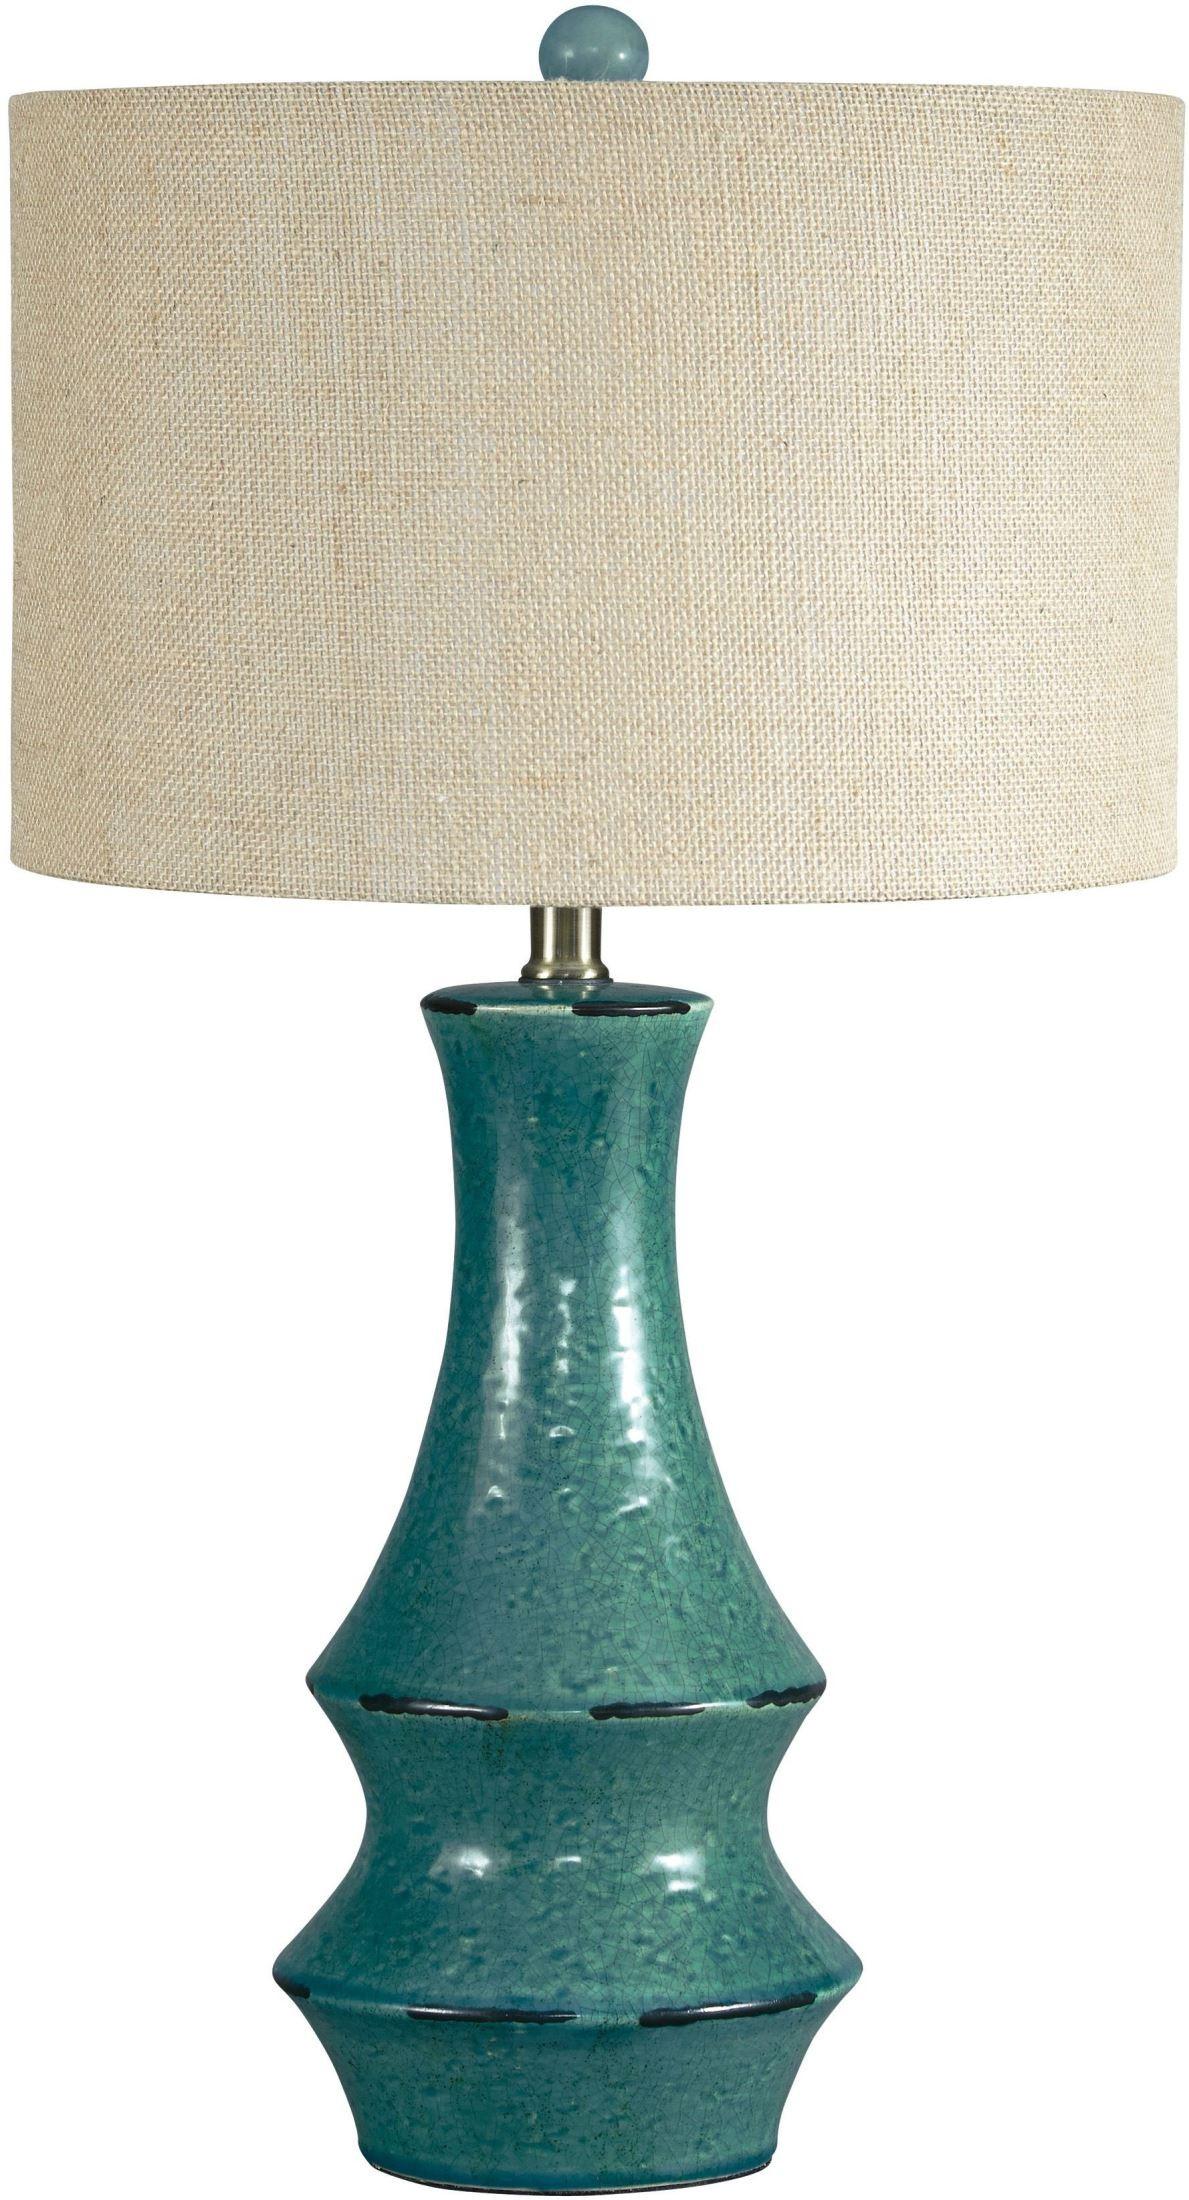 Jenci Antique Teal Ceramic Table Lamp, L100584, Ashley